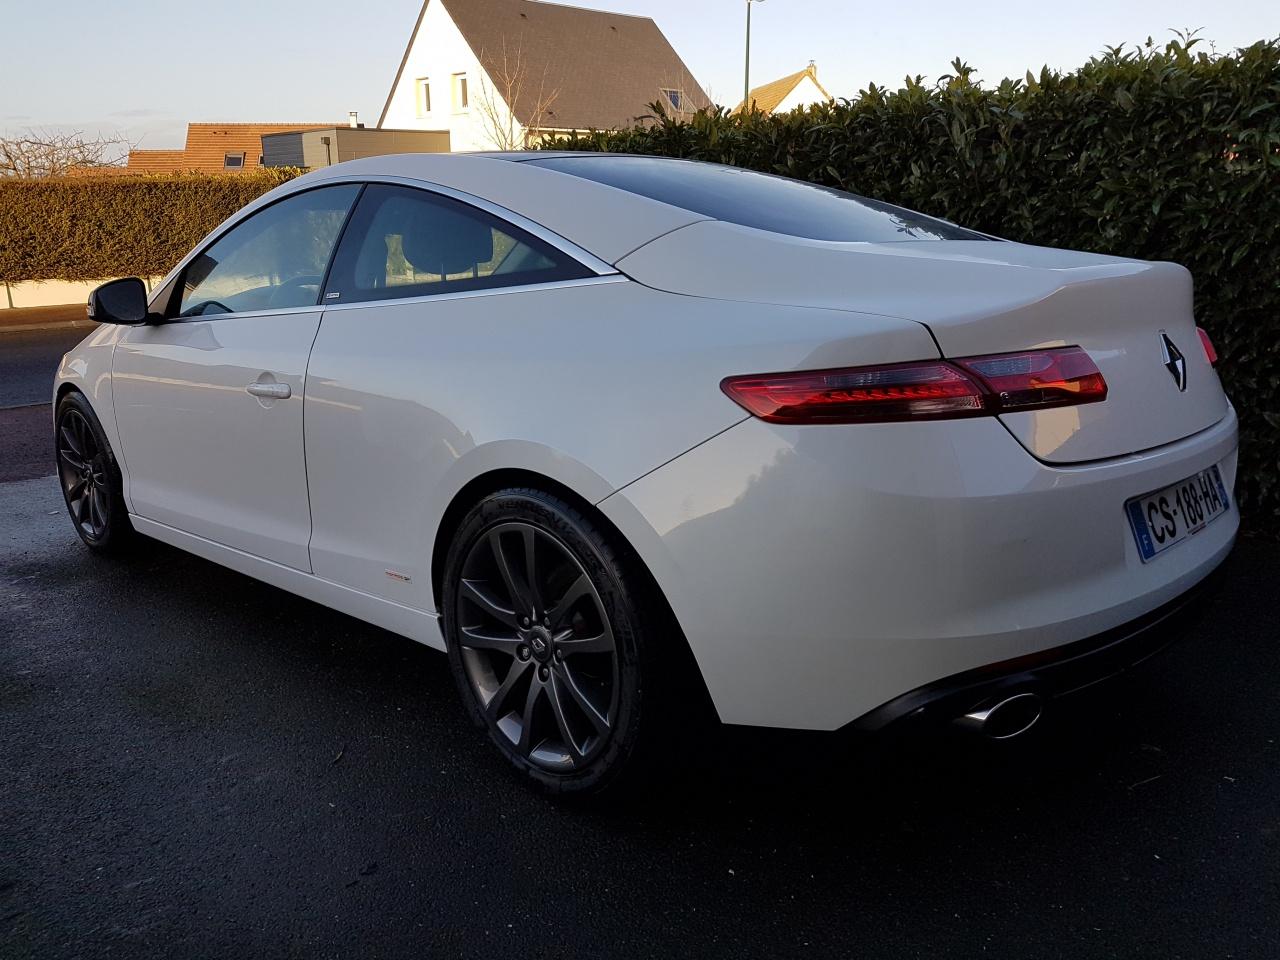 [f5sxd] Laguna III.2 Coupé 150cv Monaco Gp 72547120170102155256